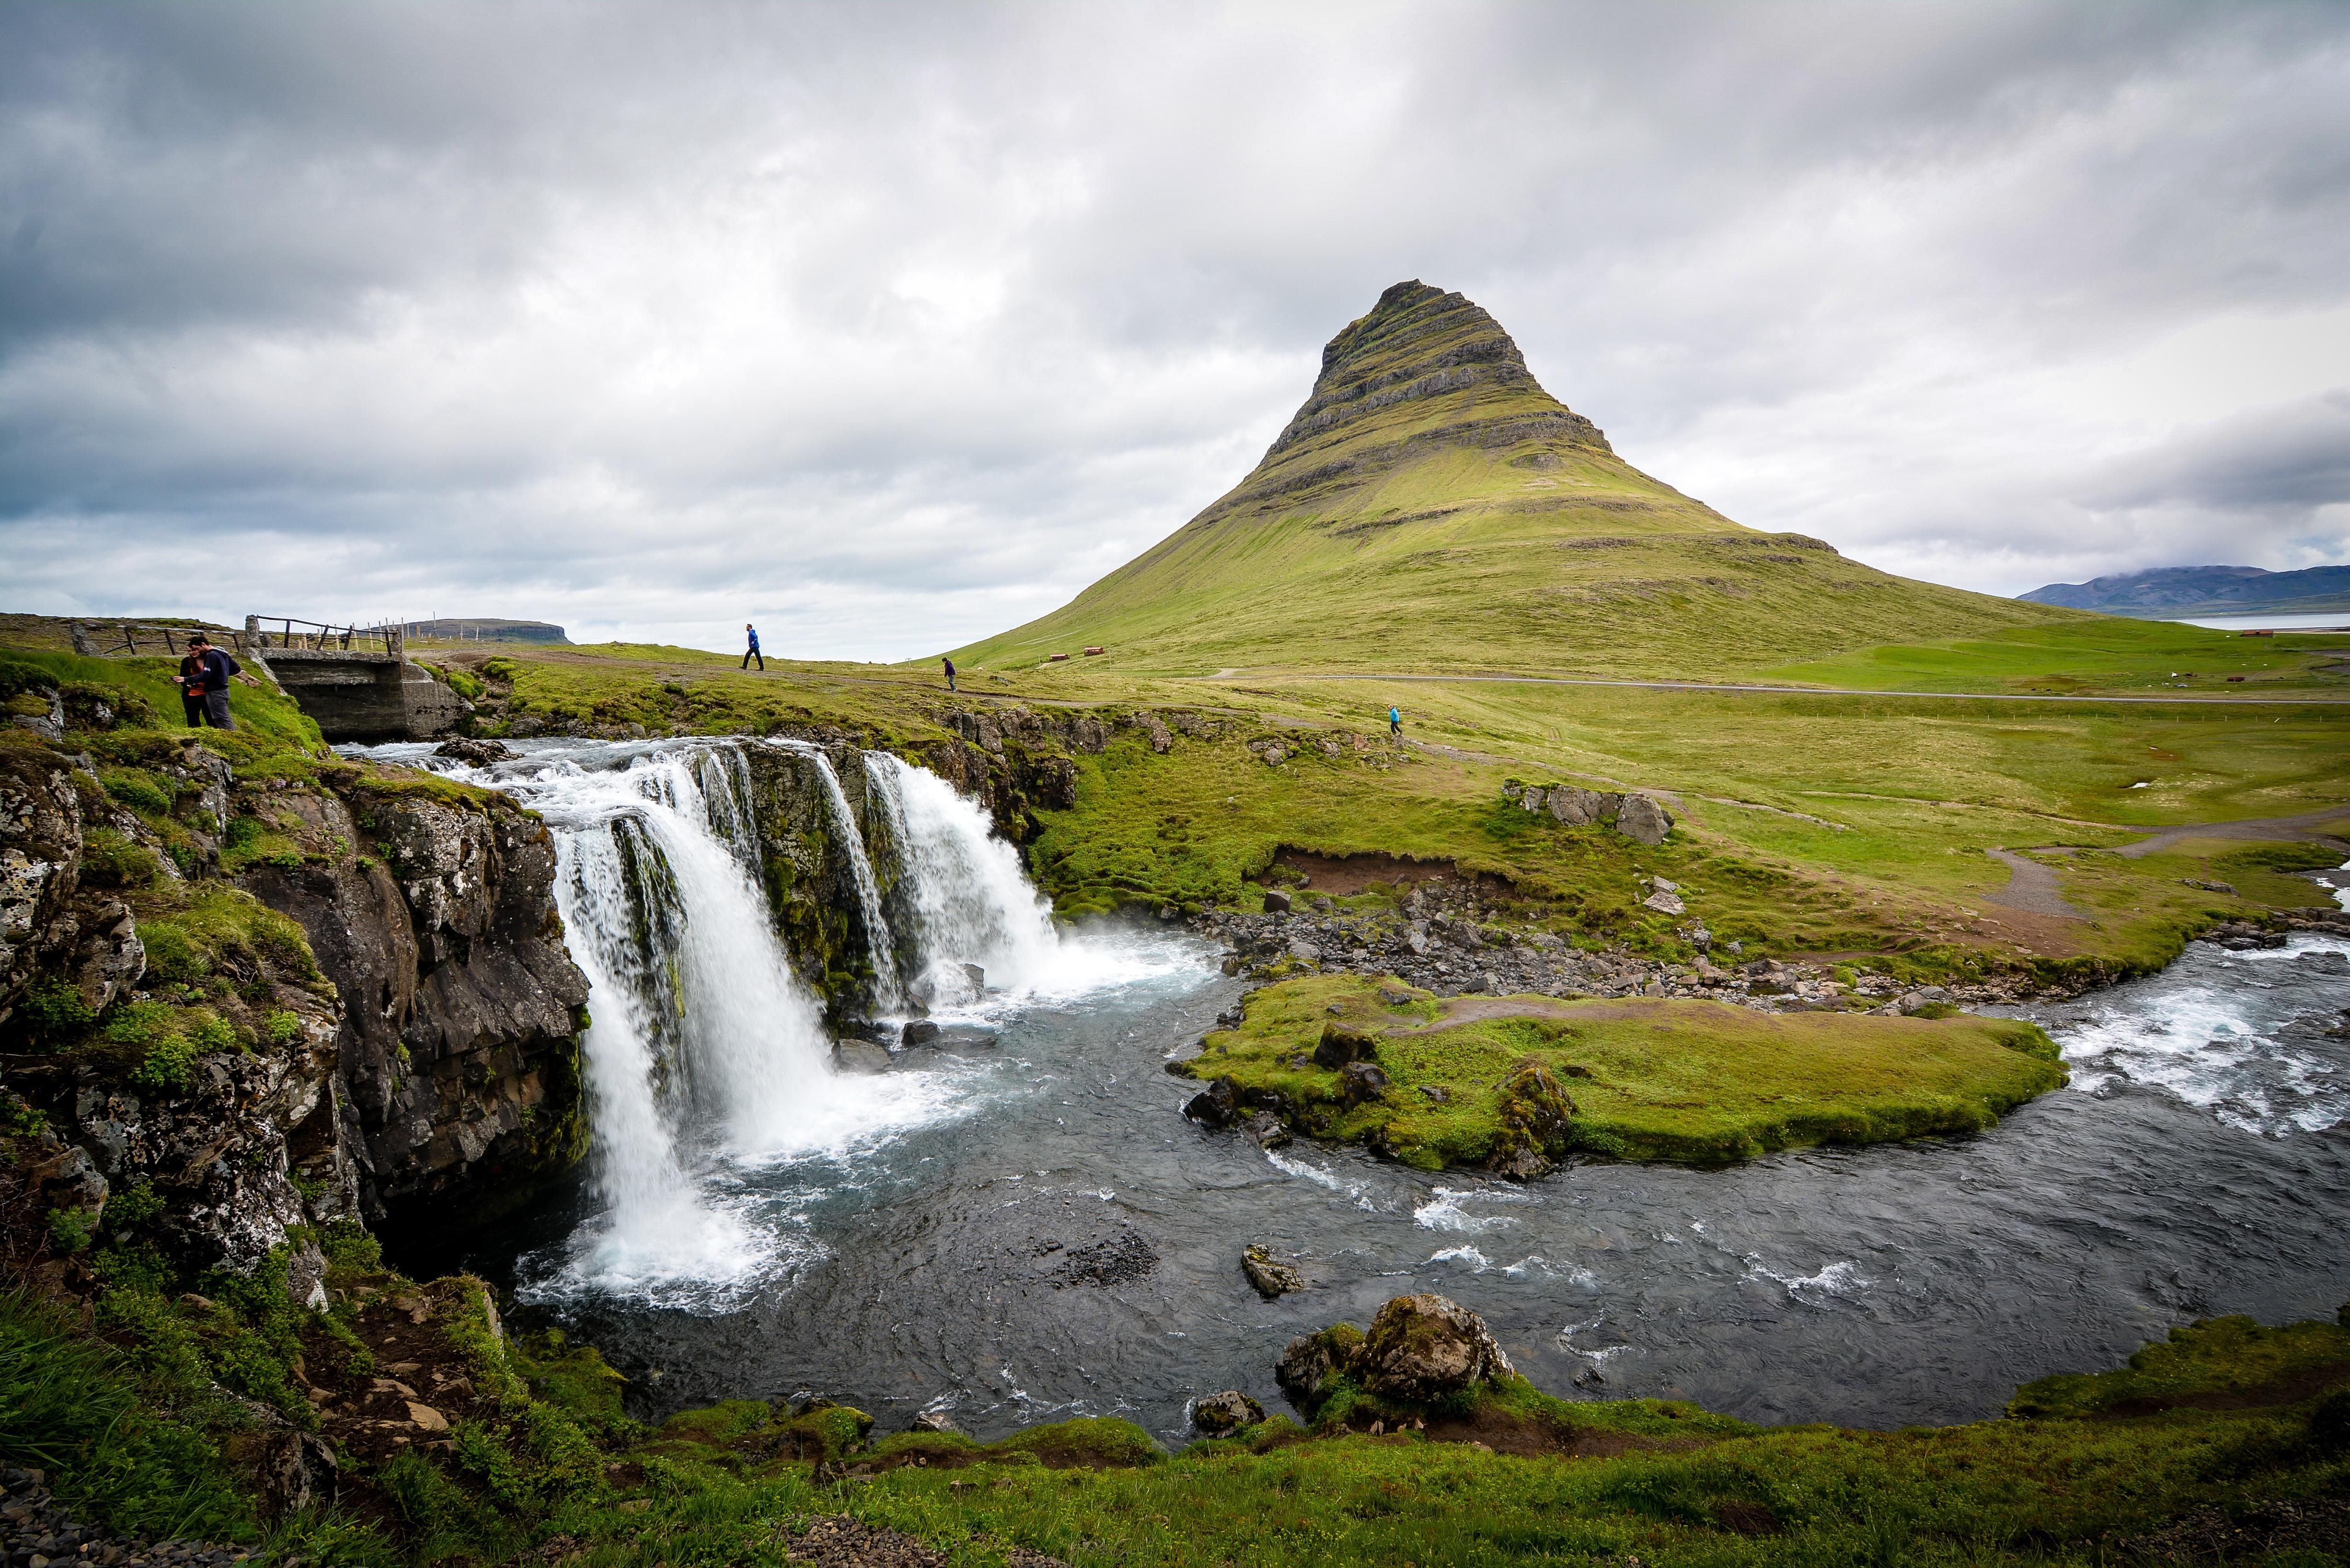 Kirkjufellsfoss waterfall on Snæfellsnes peninsula, West Region, Iceland.